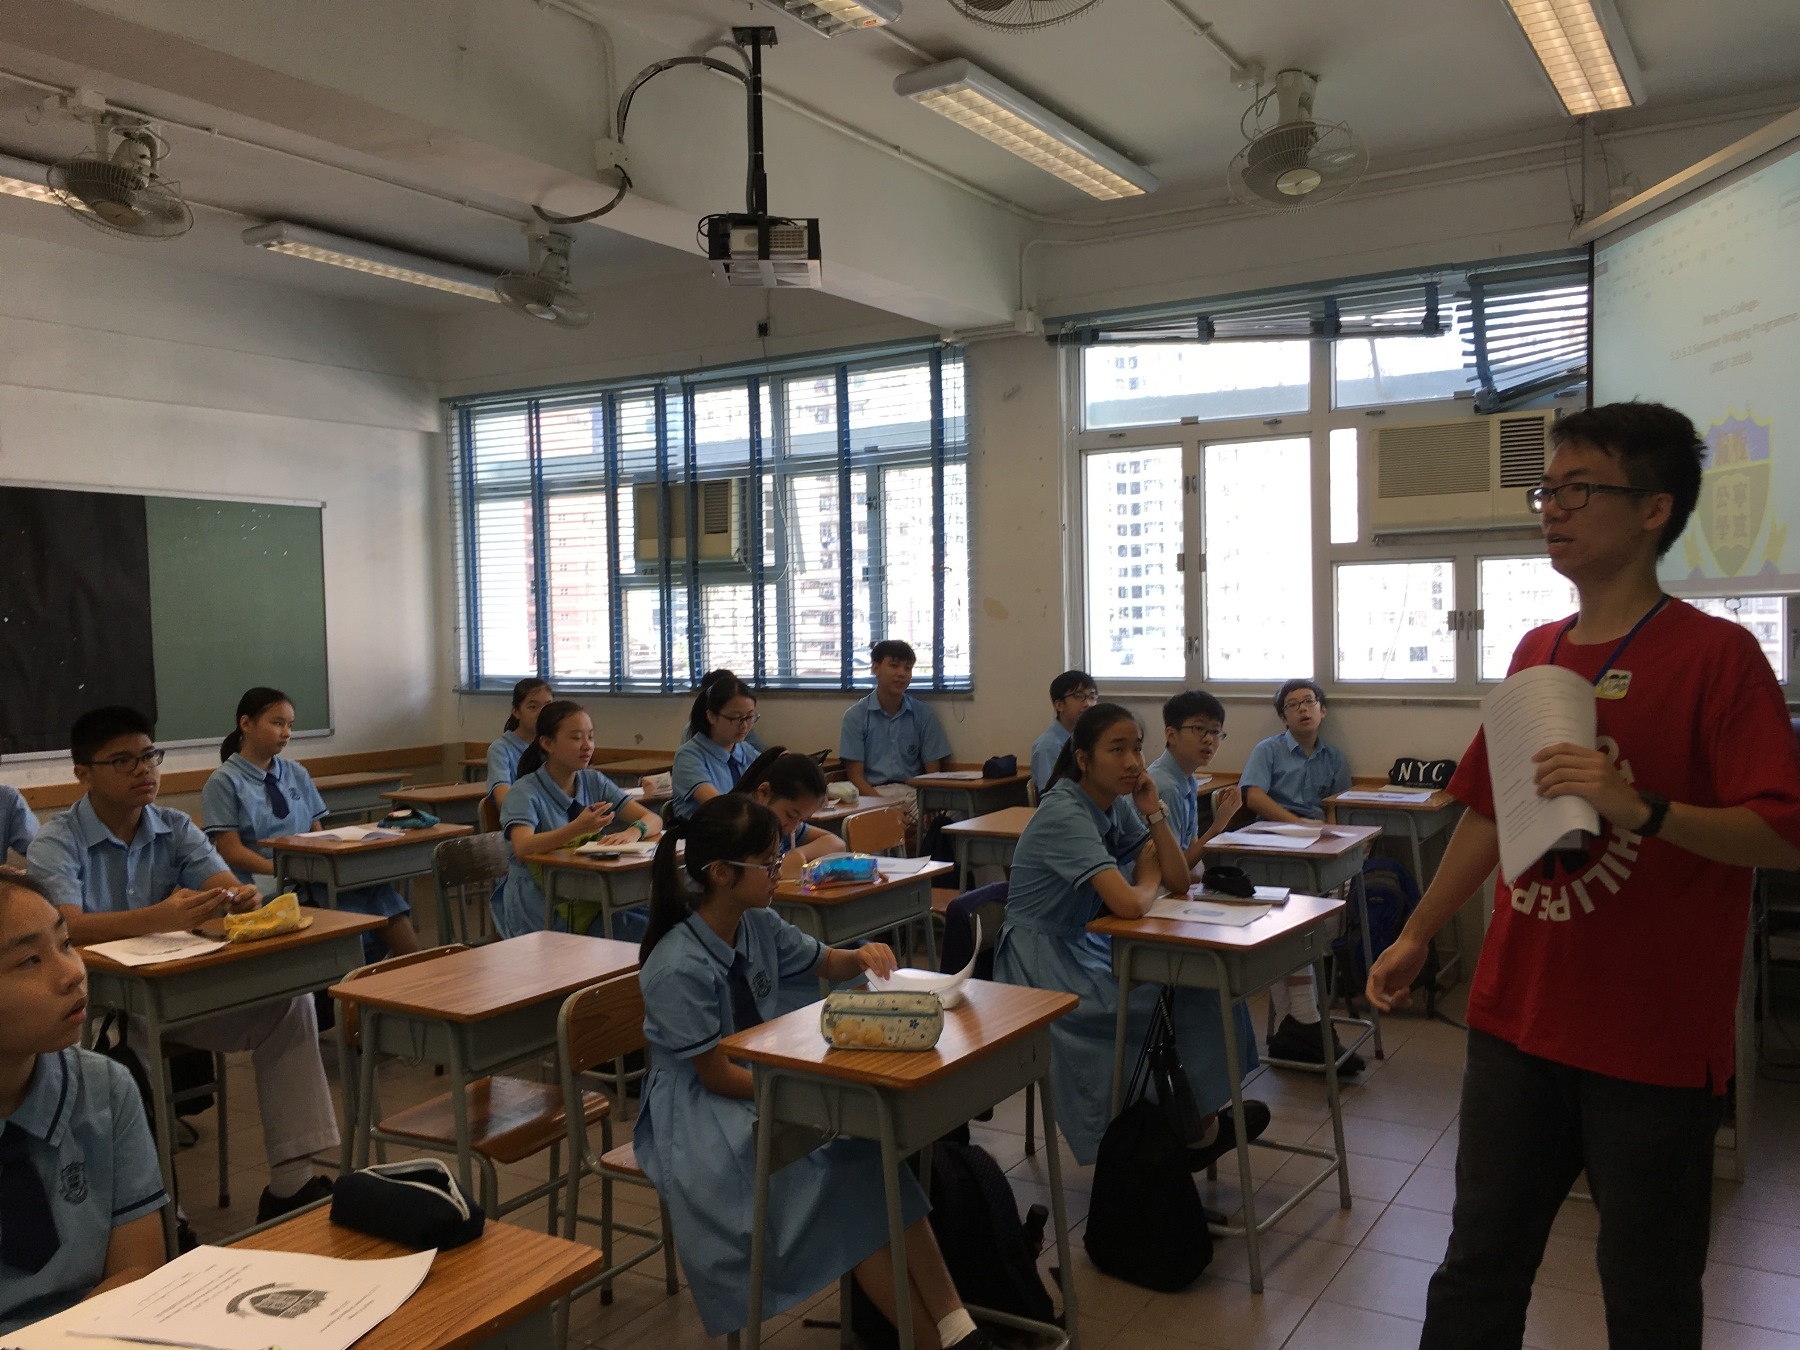 http://www.npc.edu.hk/sites/default/files/img_1015.jpg